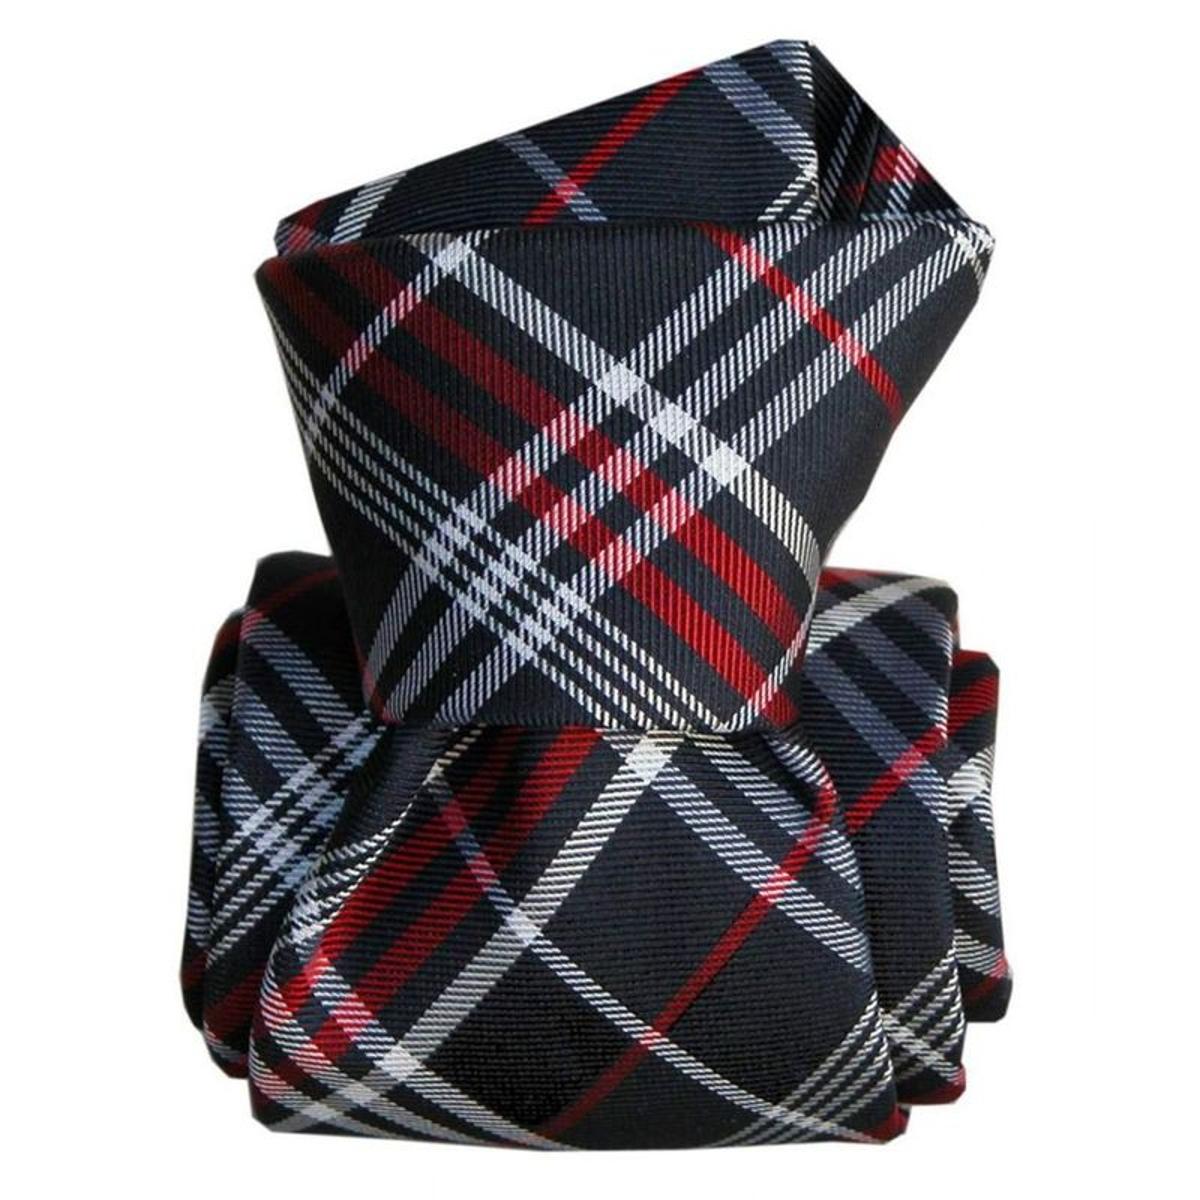 Cravate luxe soie livigno